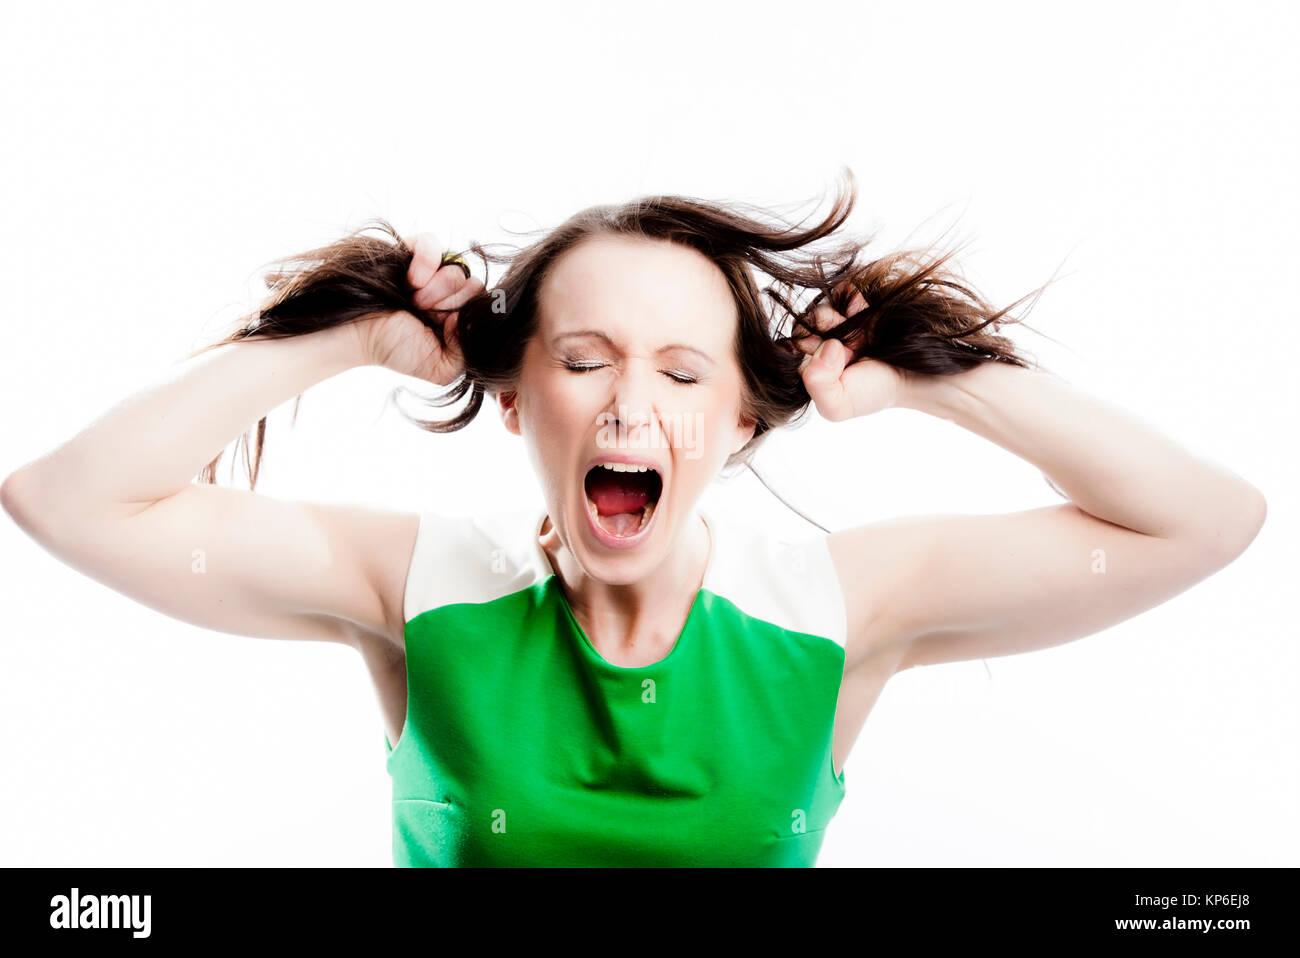 Frau zieht an ihren Haaren - woman with brown hair Stock Photo